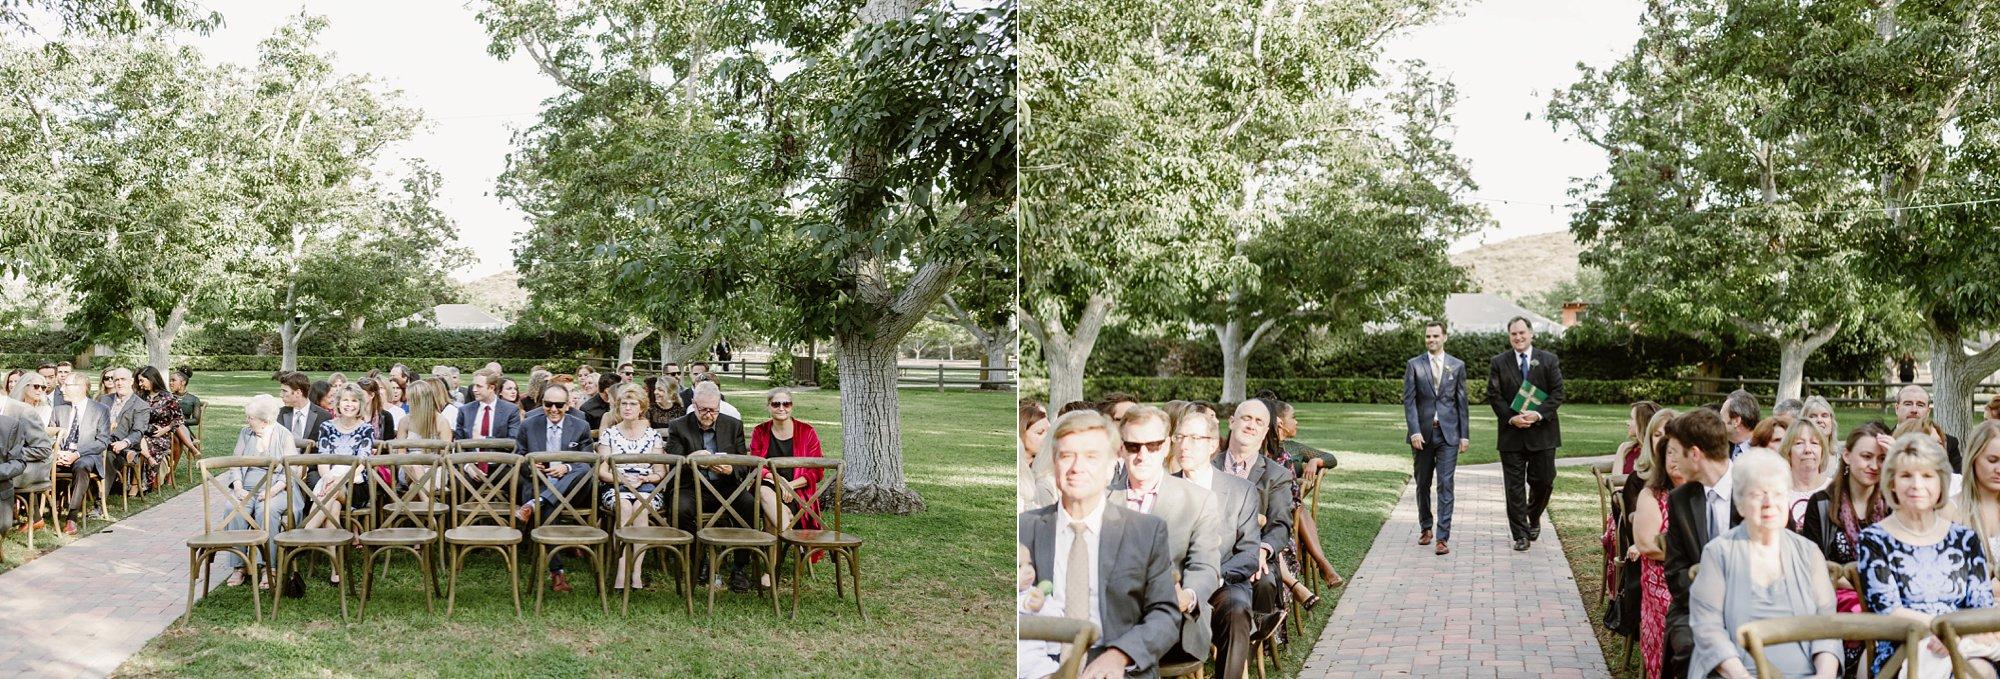 Walnut Grove Moorpark California Wedding_0013.jpg